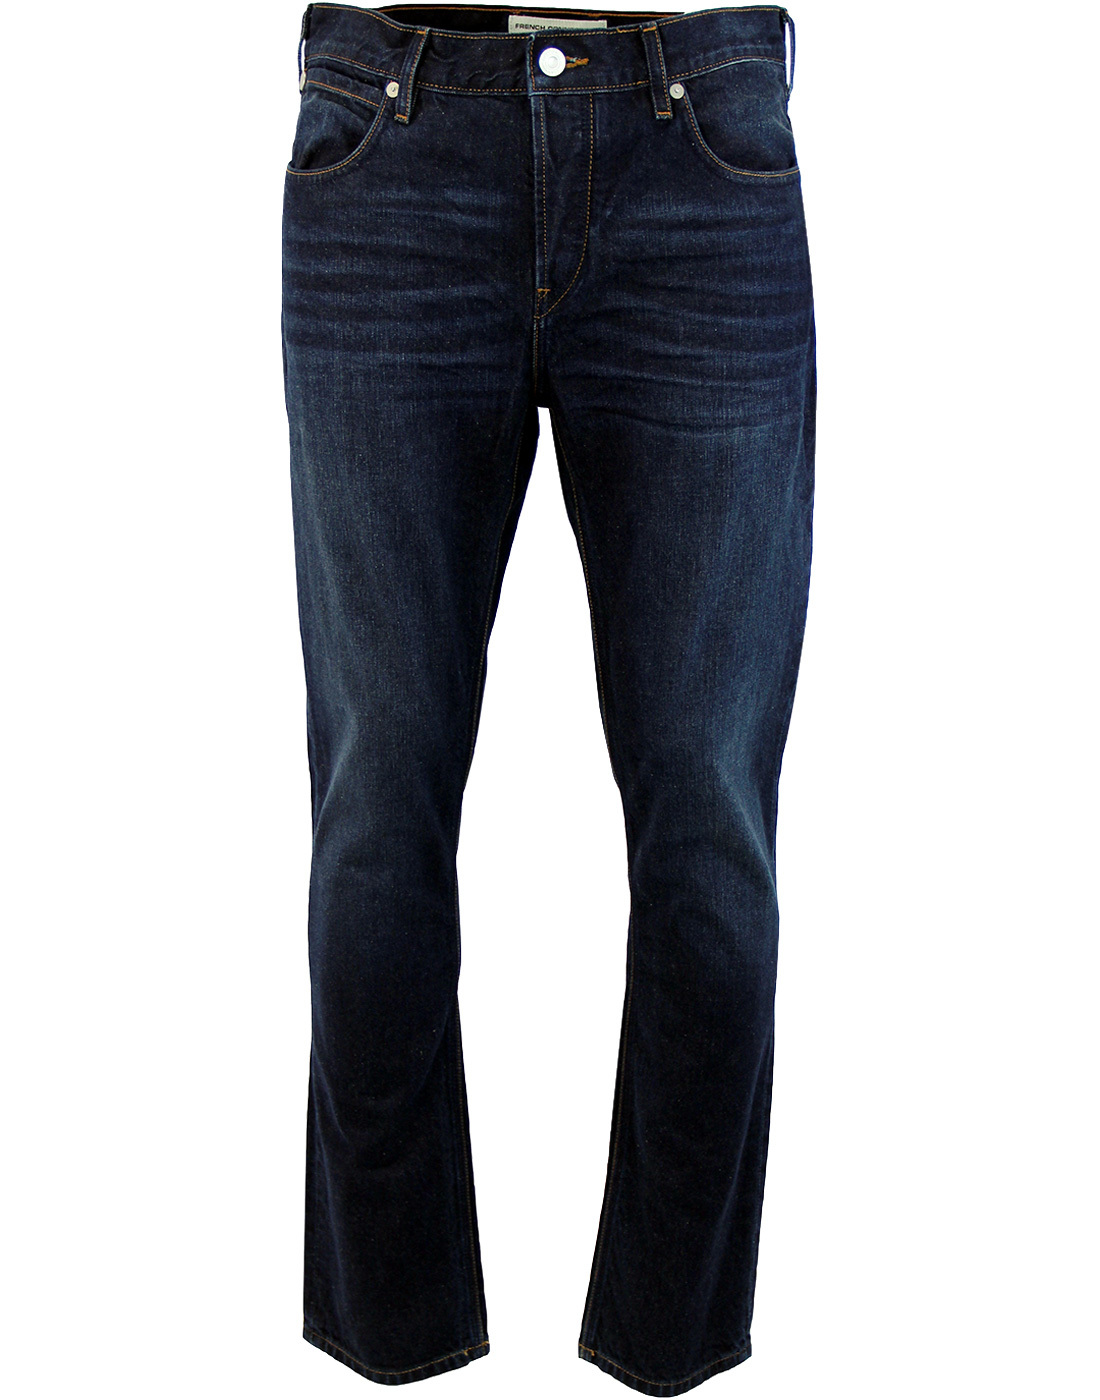 French Connection Jeans Indigo Blue Regular Standard Straight Leg Denim Pants